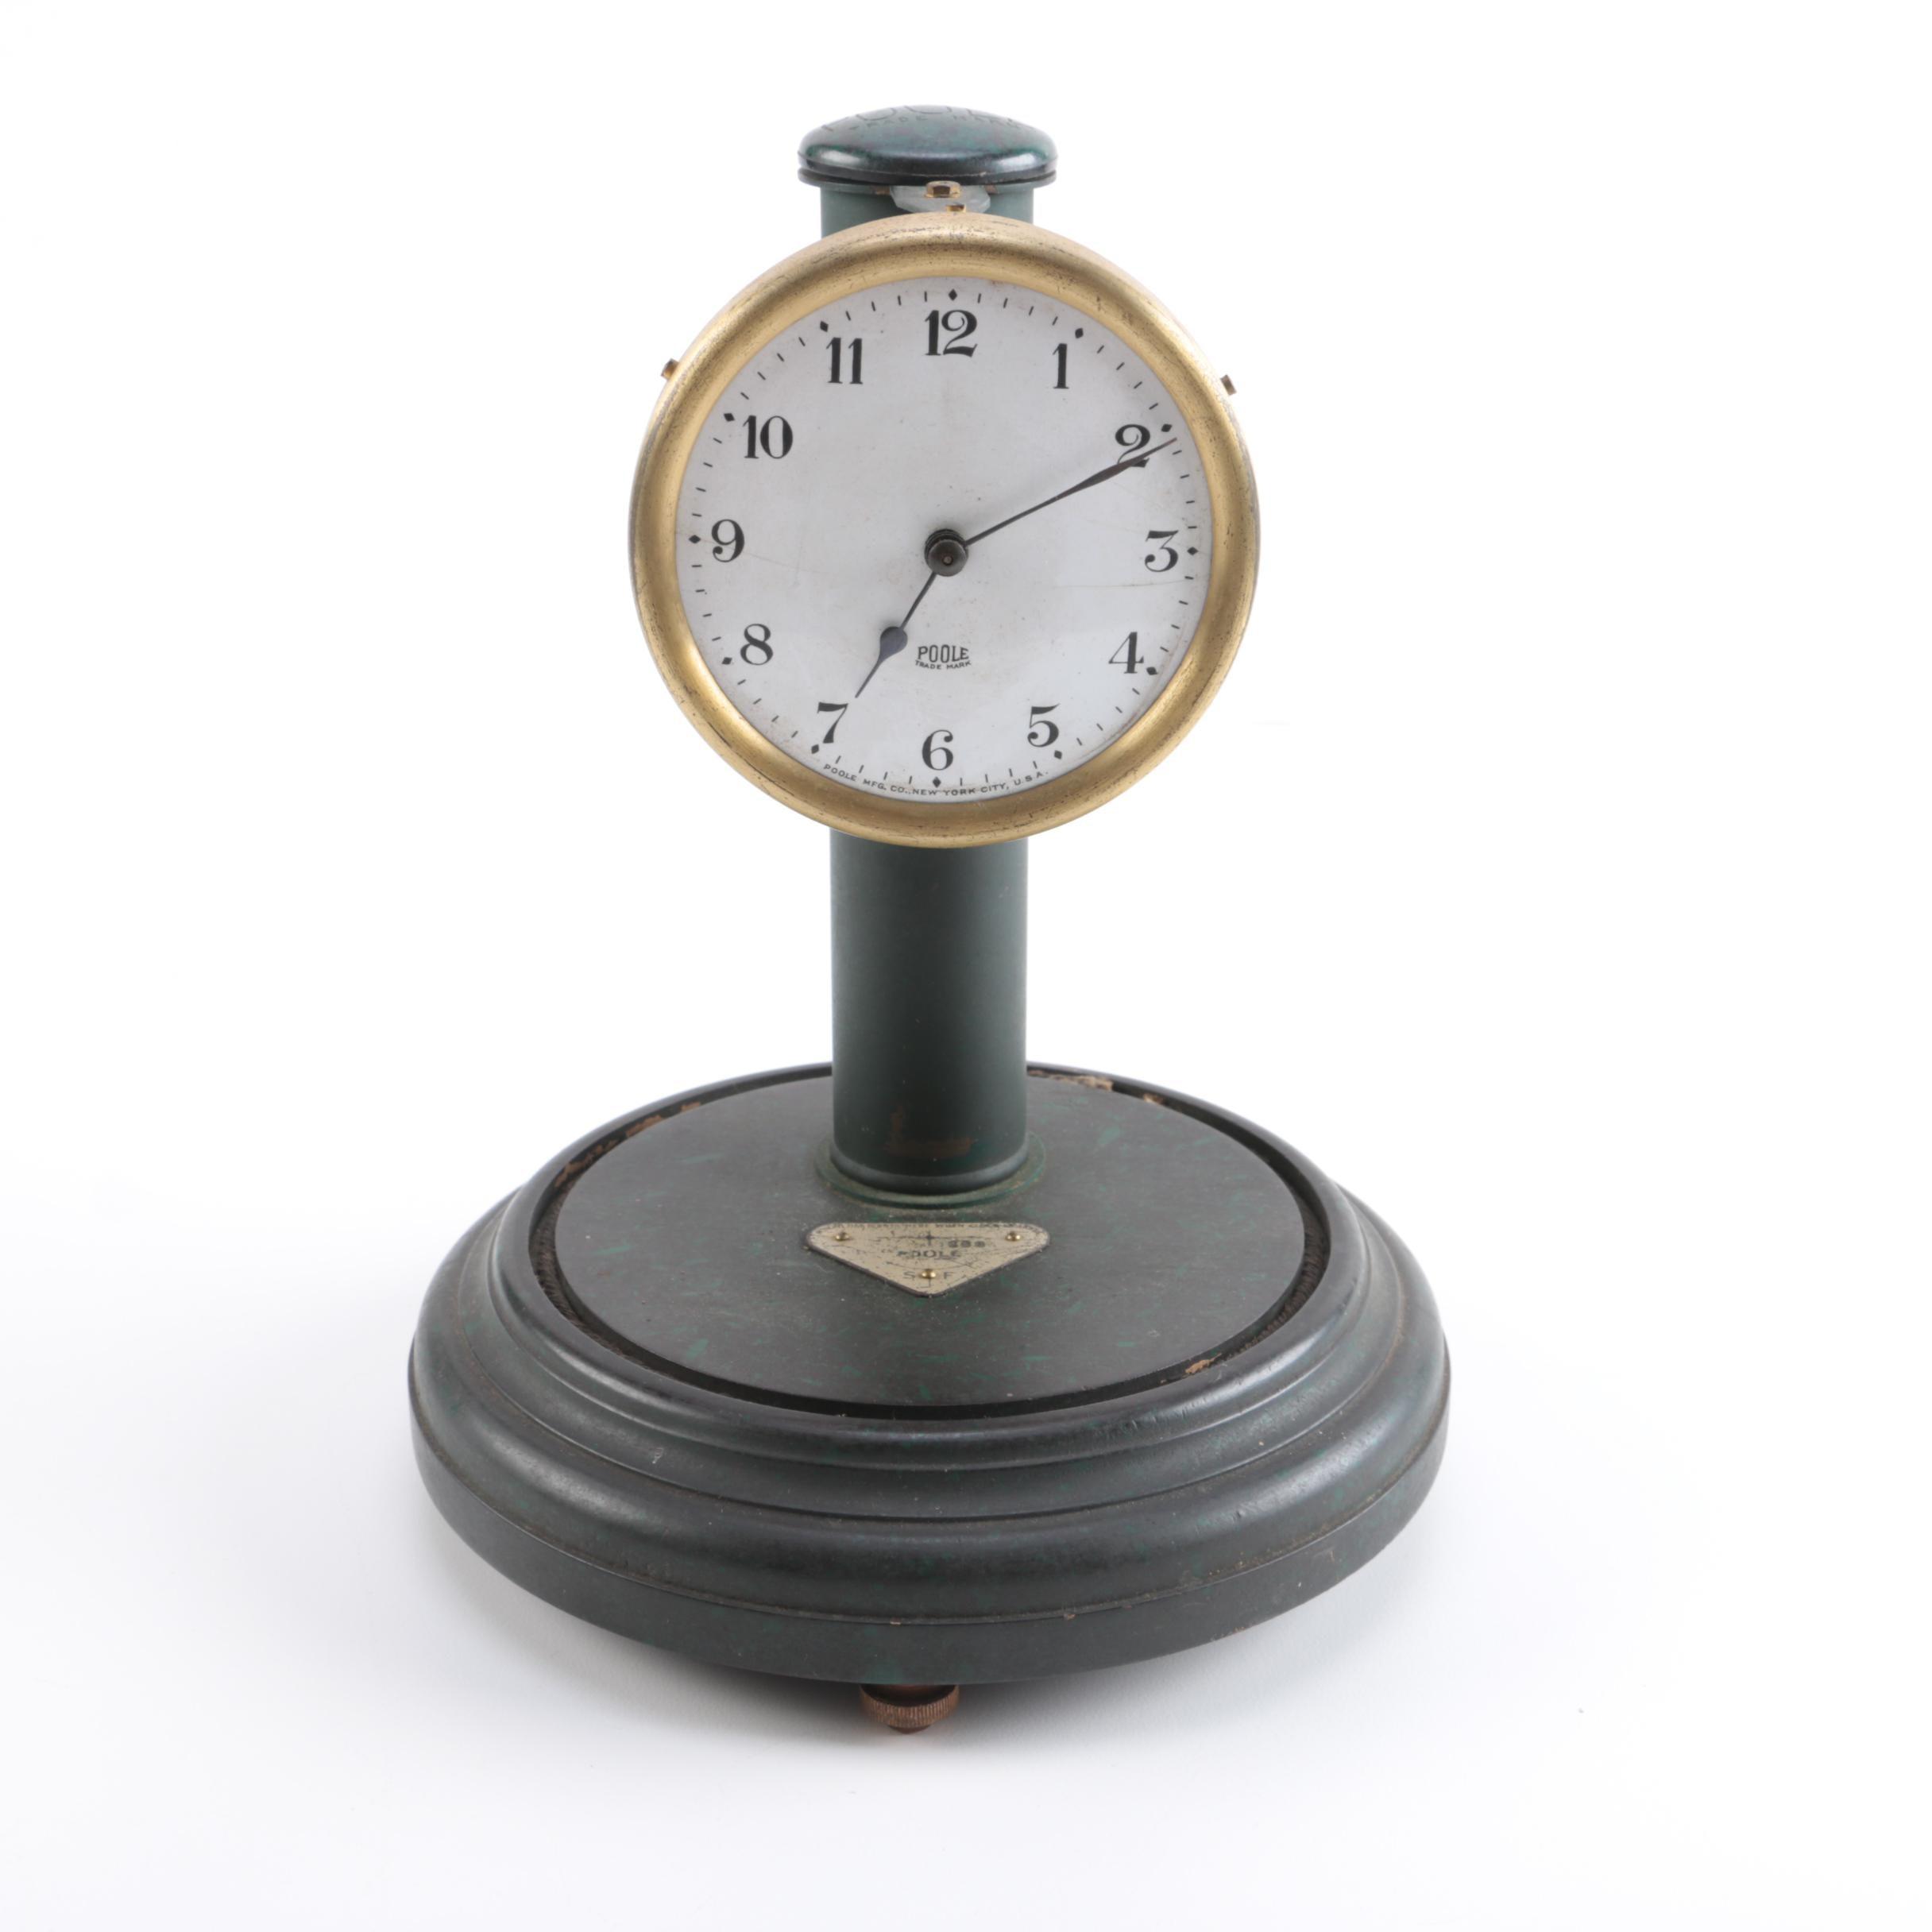 Poole Analog Mantle Clock